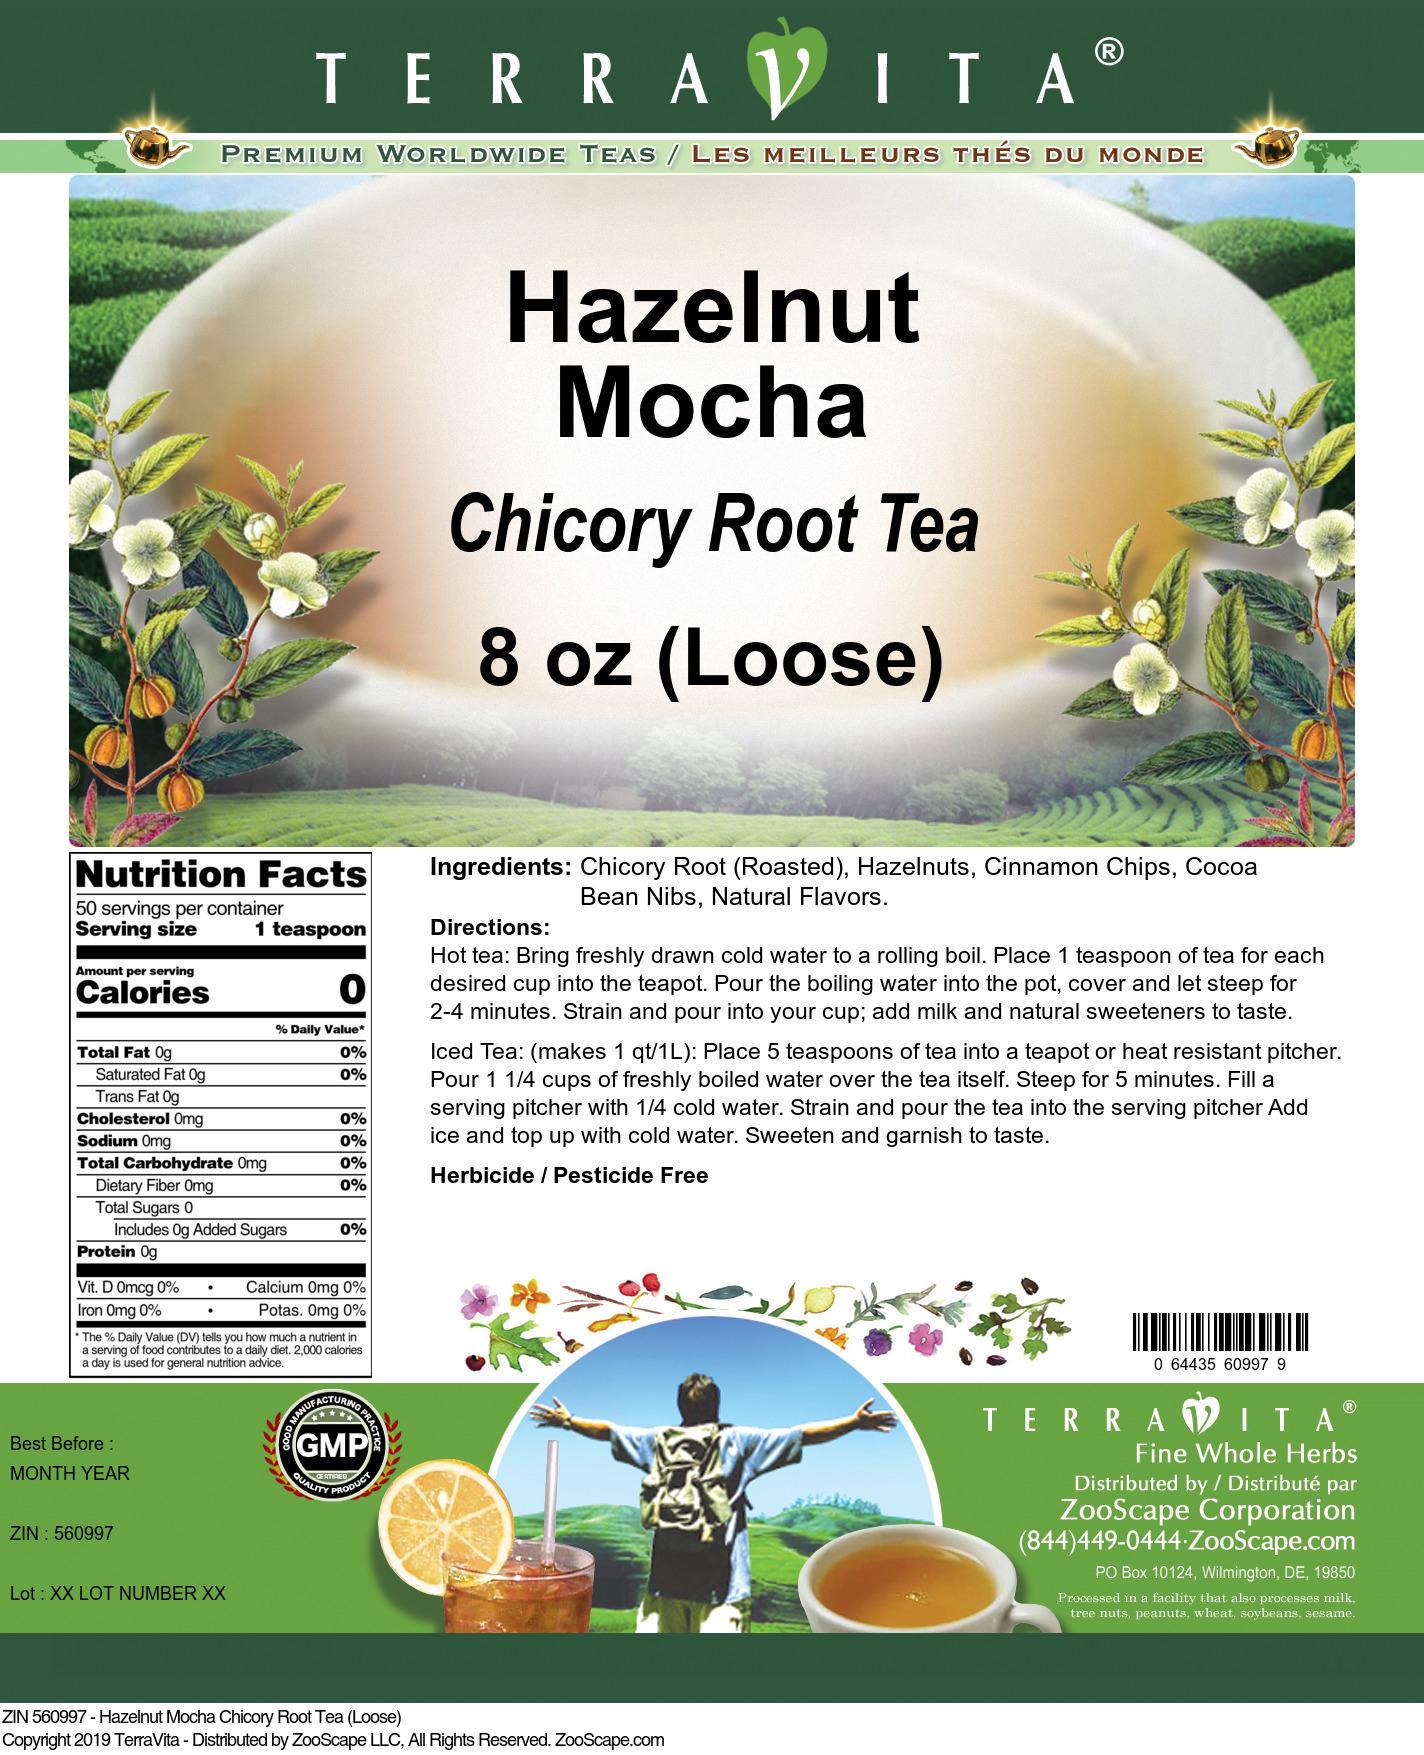 Hazelnut Mocha Chicory Root Tea (Loose)